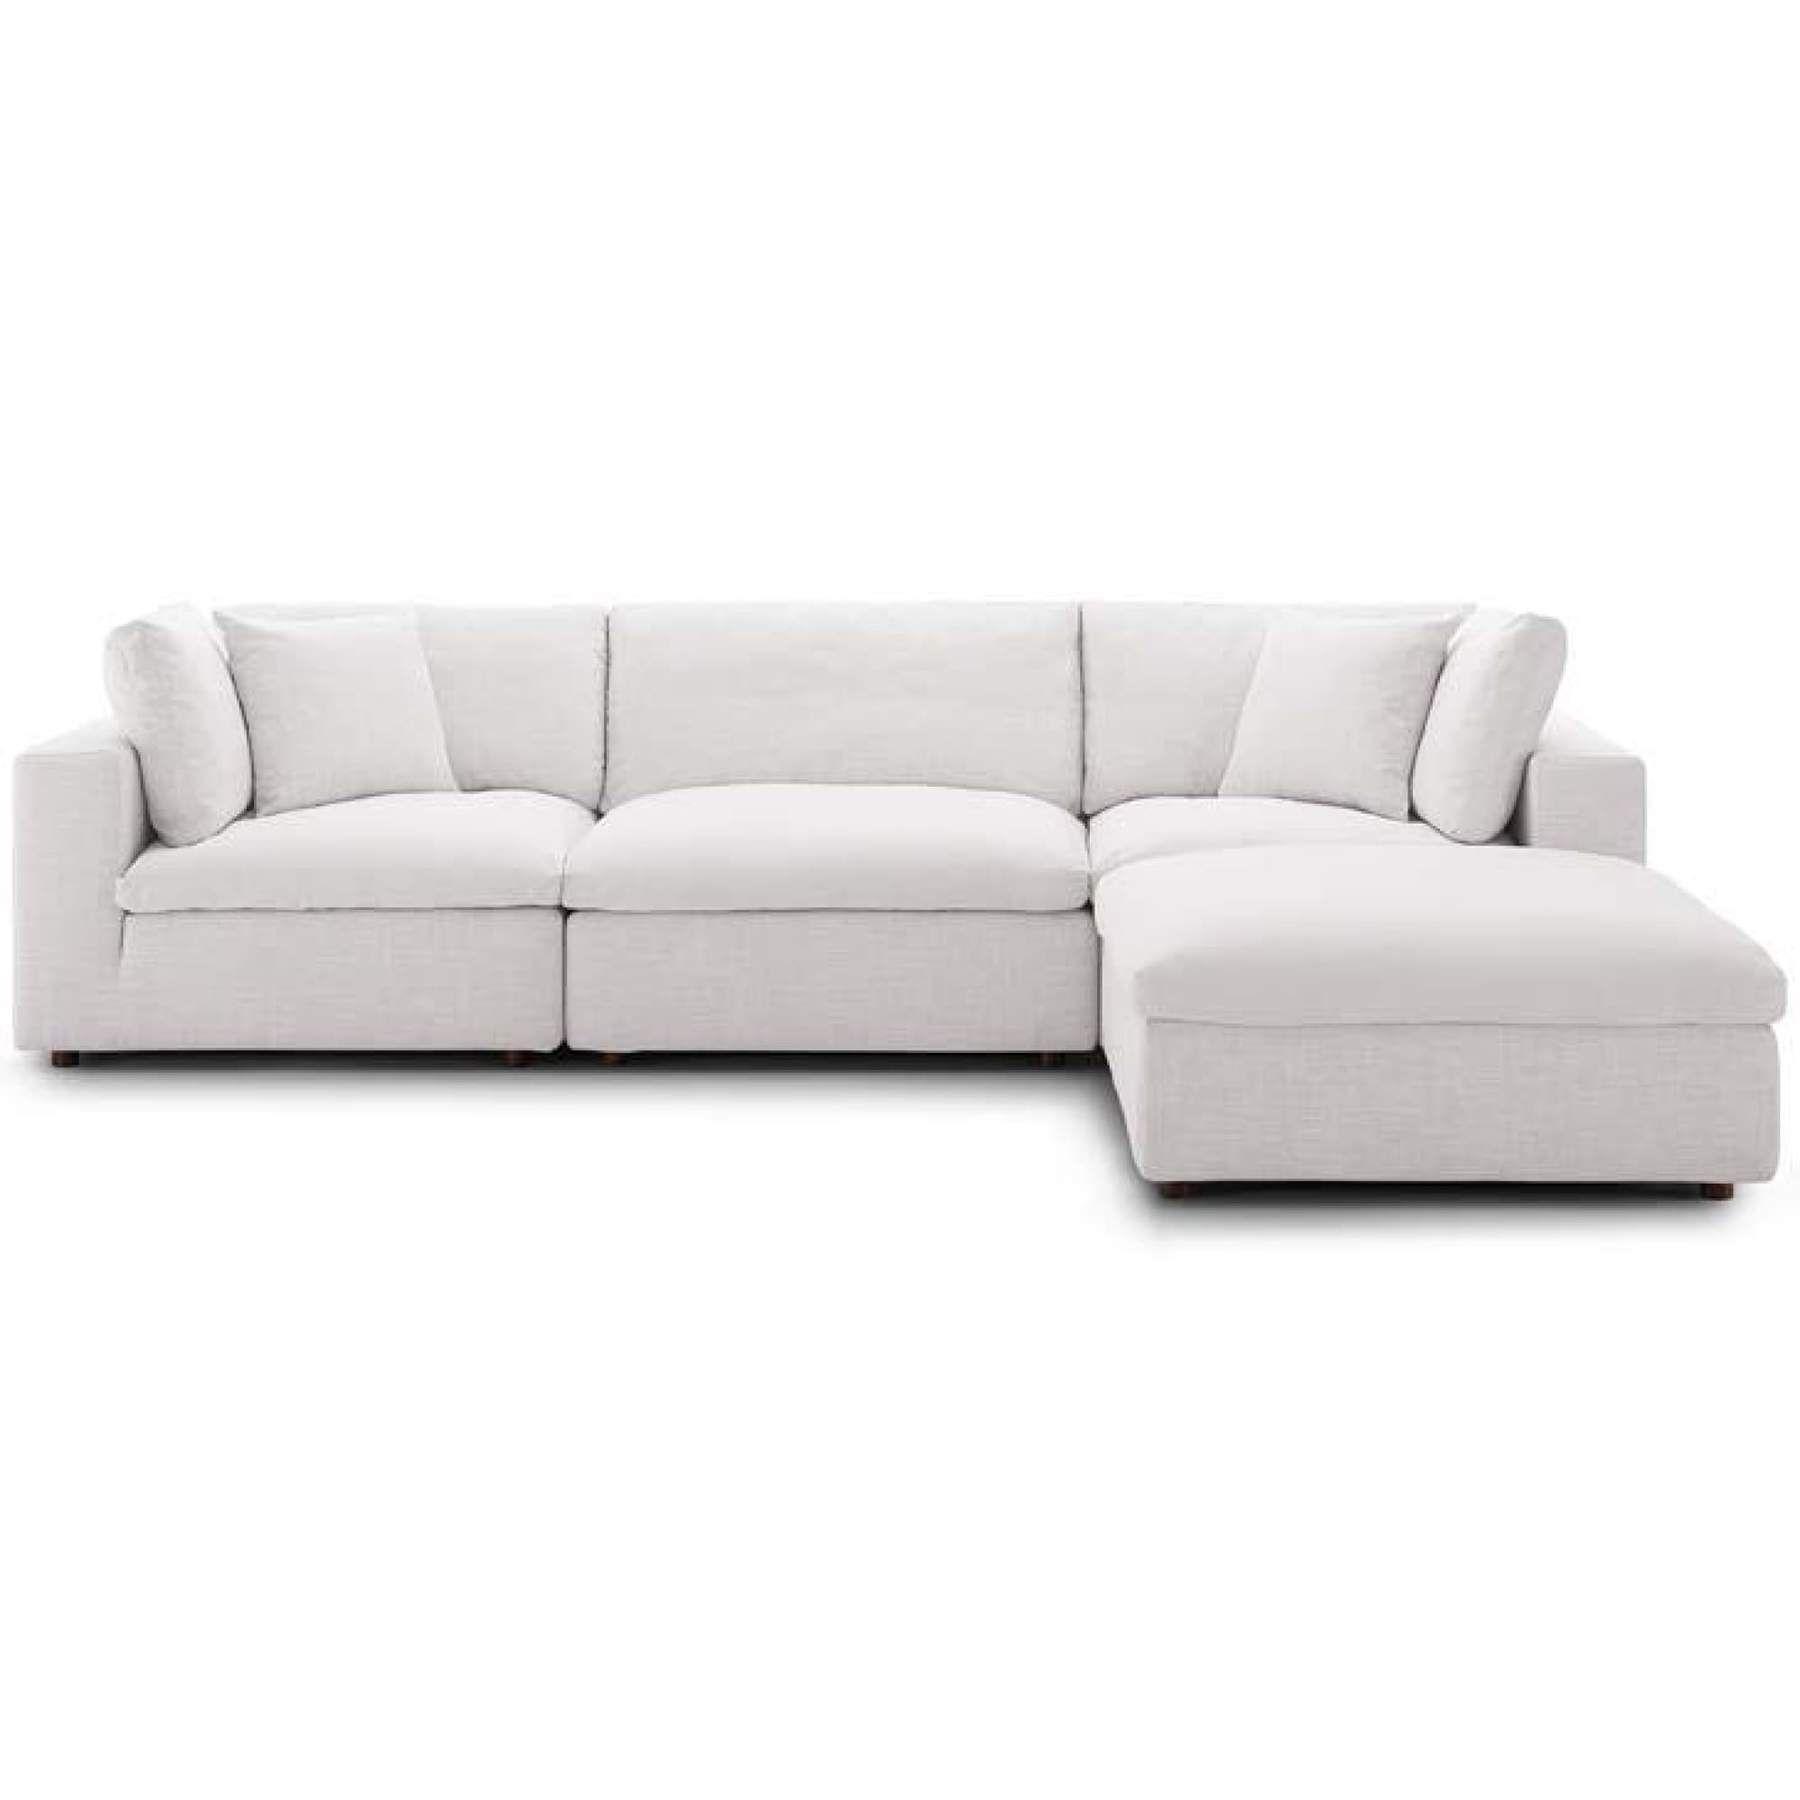 Crux Down Filled Overstuffed 4 Piece Sectional Sofa Beige Sofa